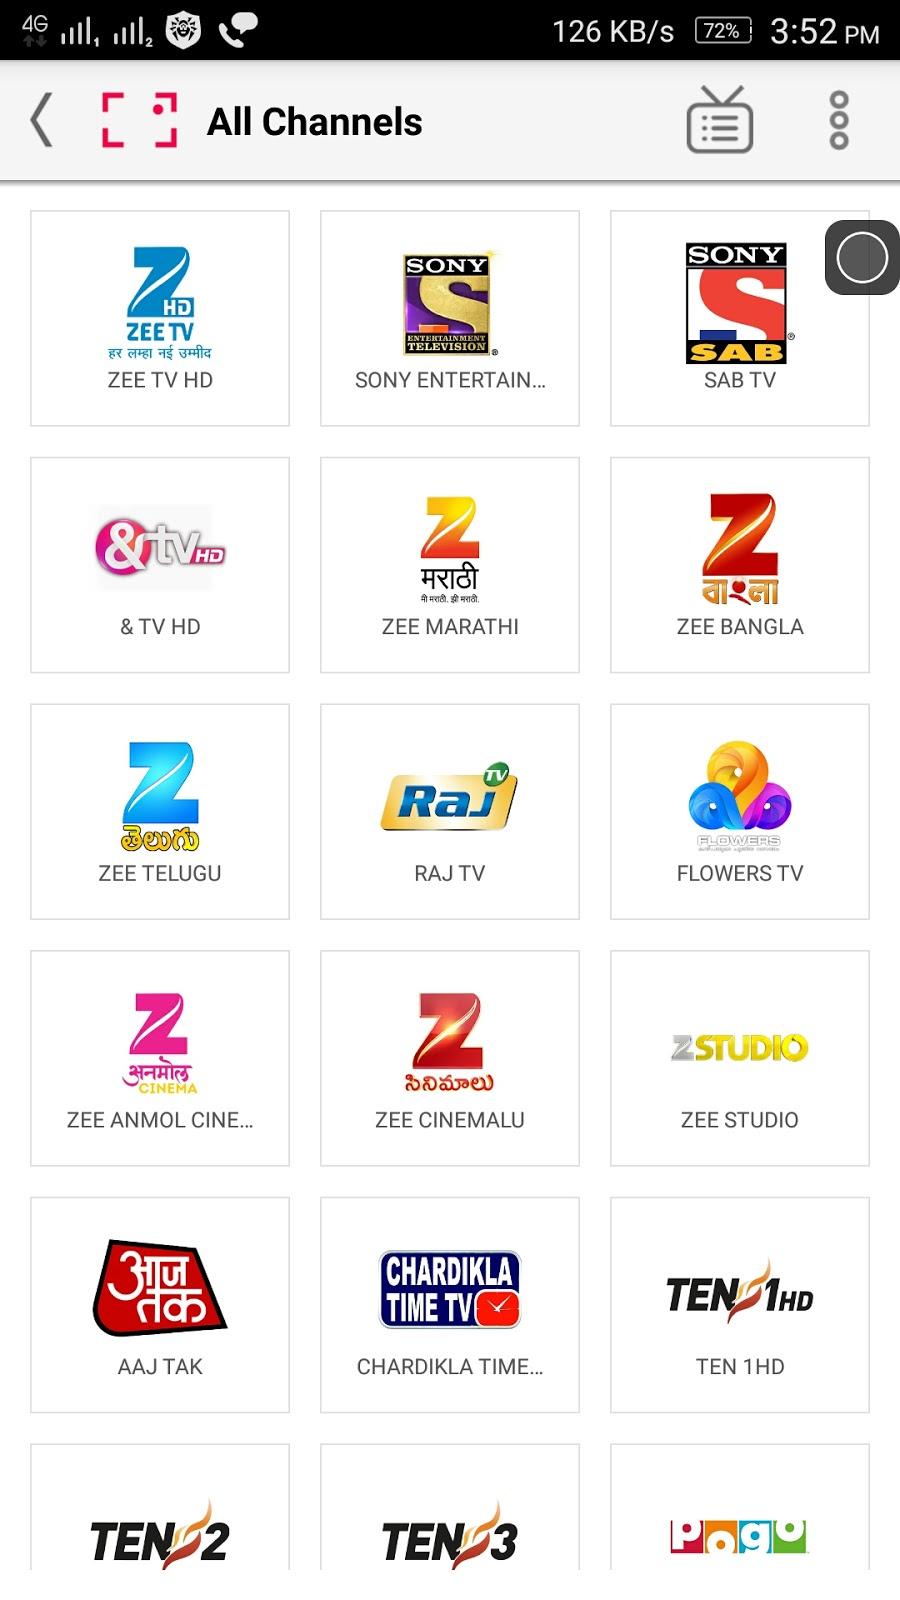 Ditto TV v4 0 20170322 1 cracked APK (Latest)